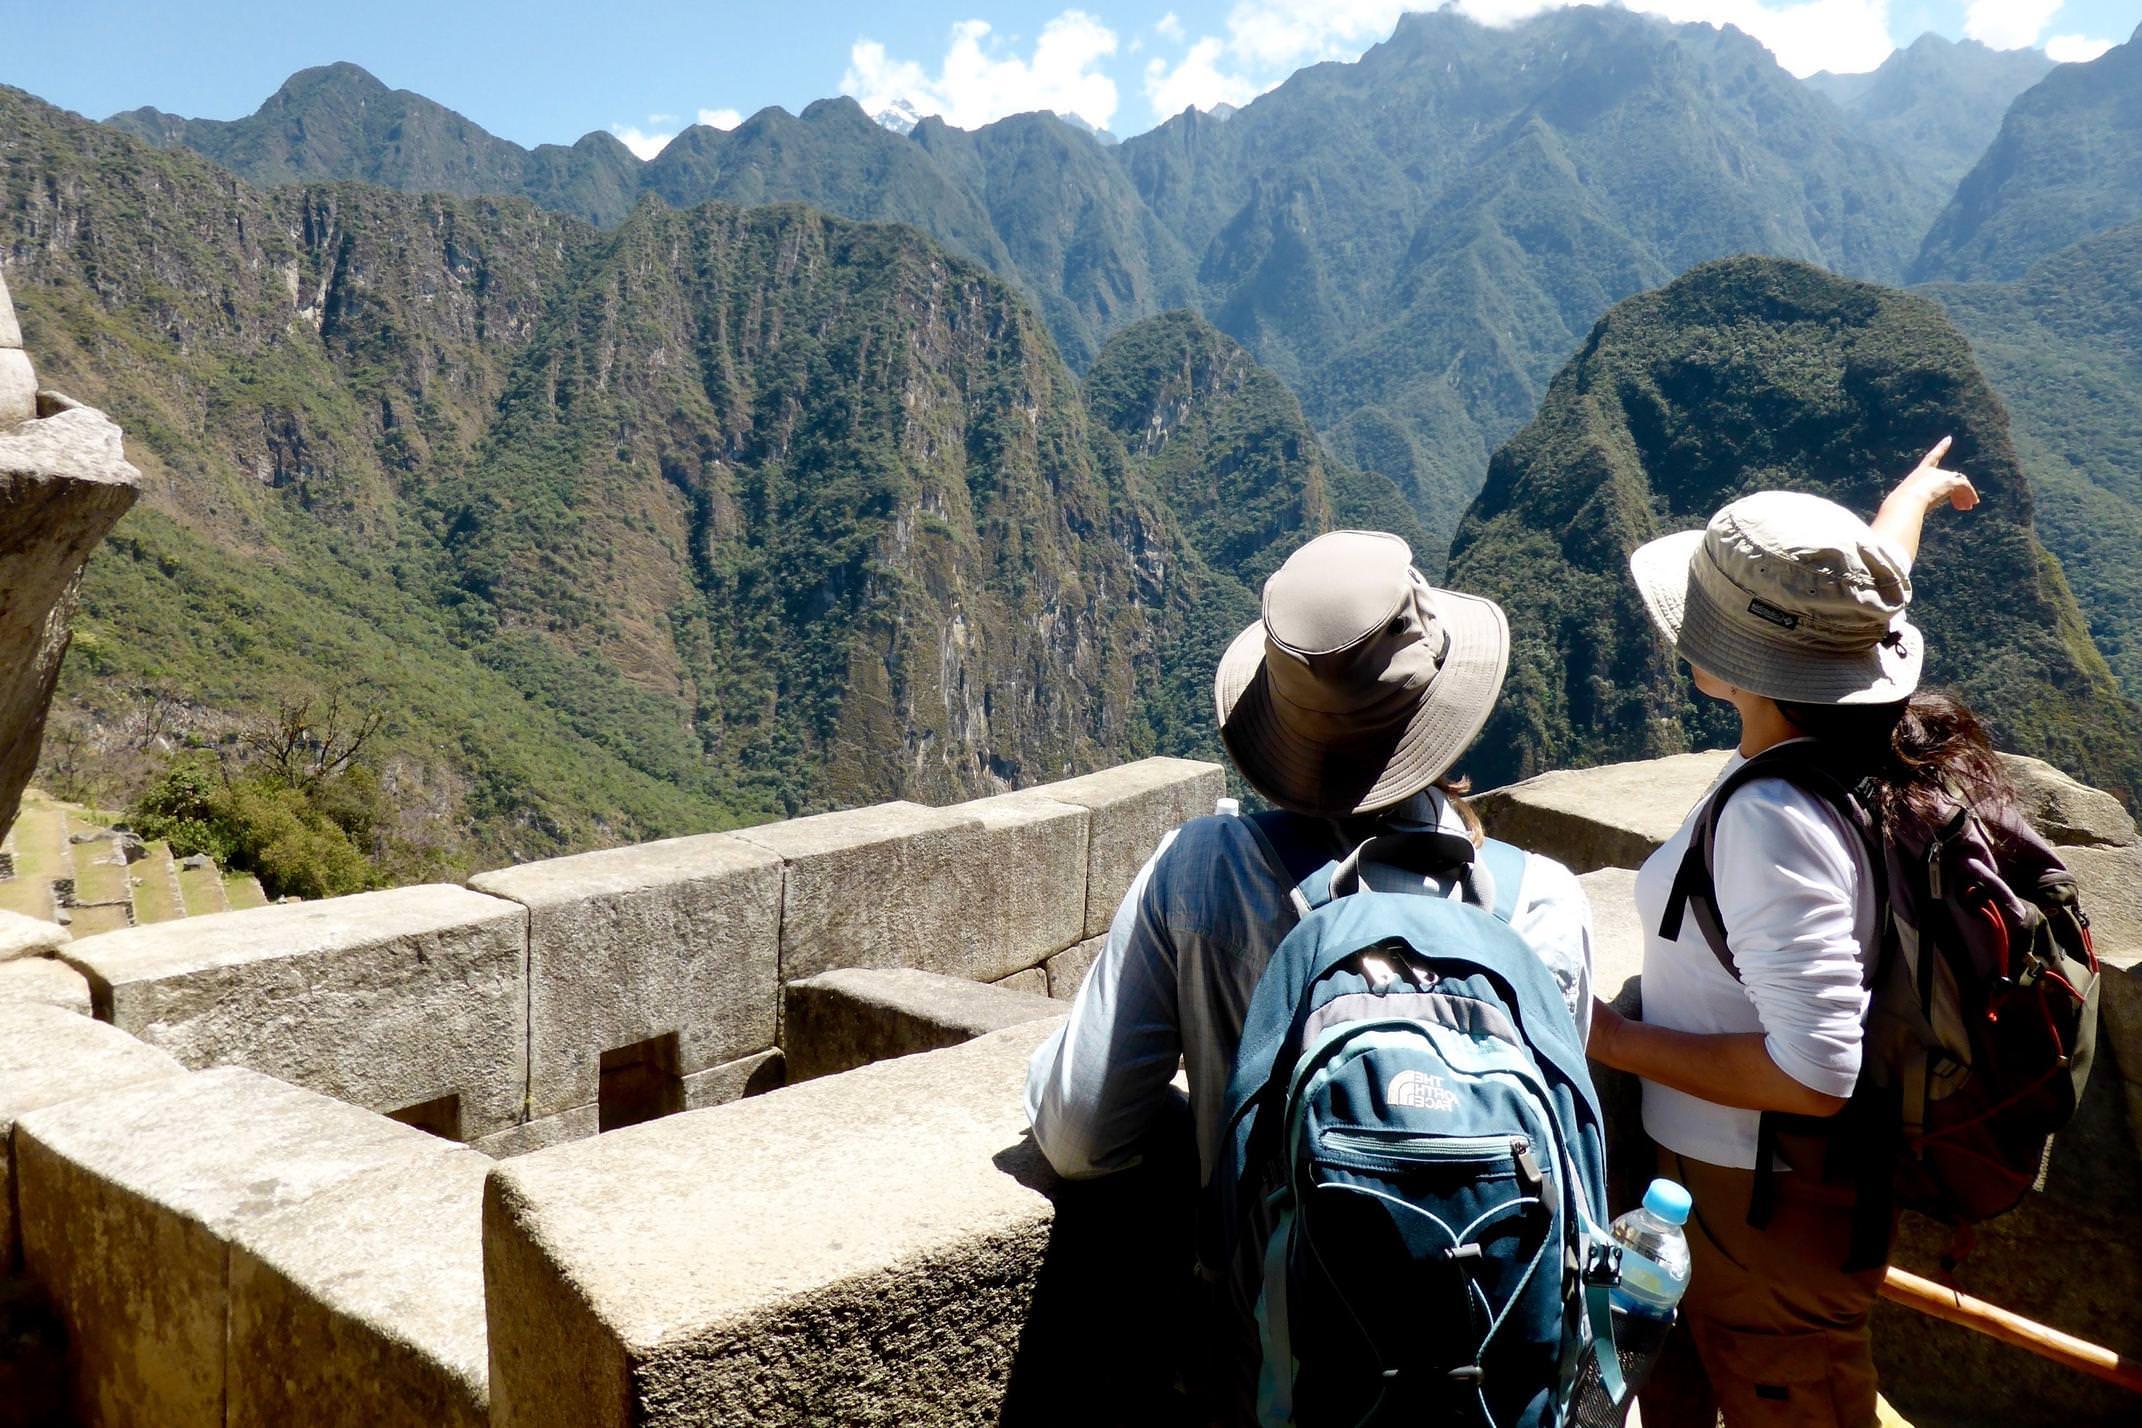 Peru inca trail to machu picchu guide pointing over mountains2